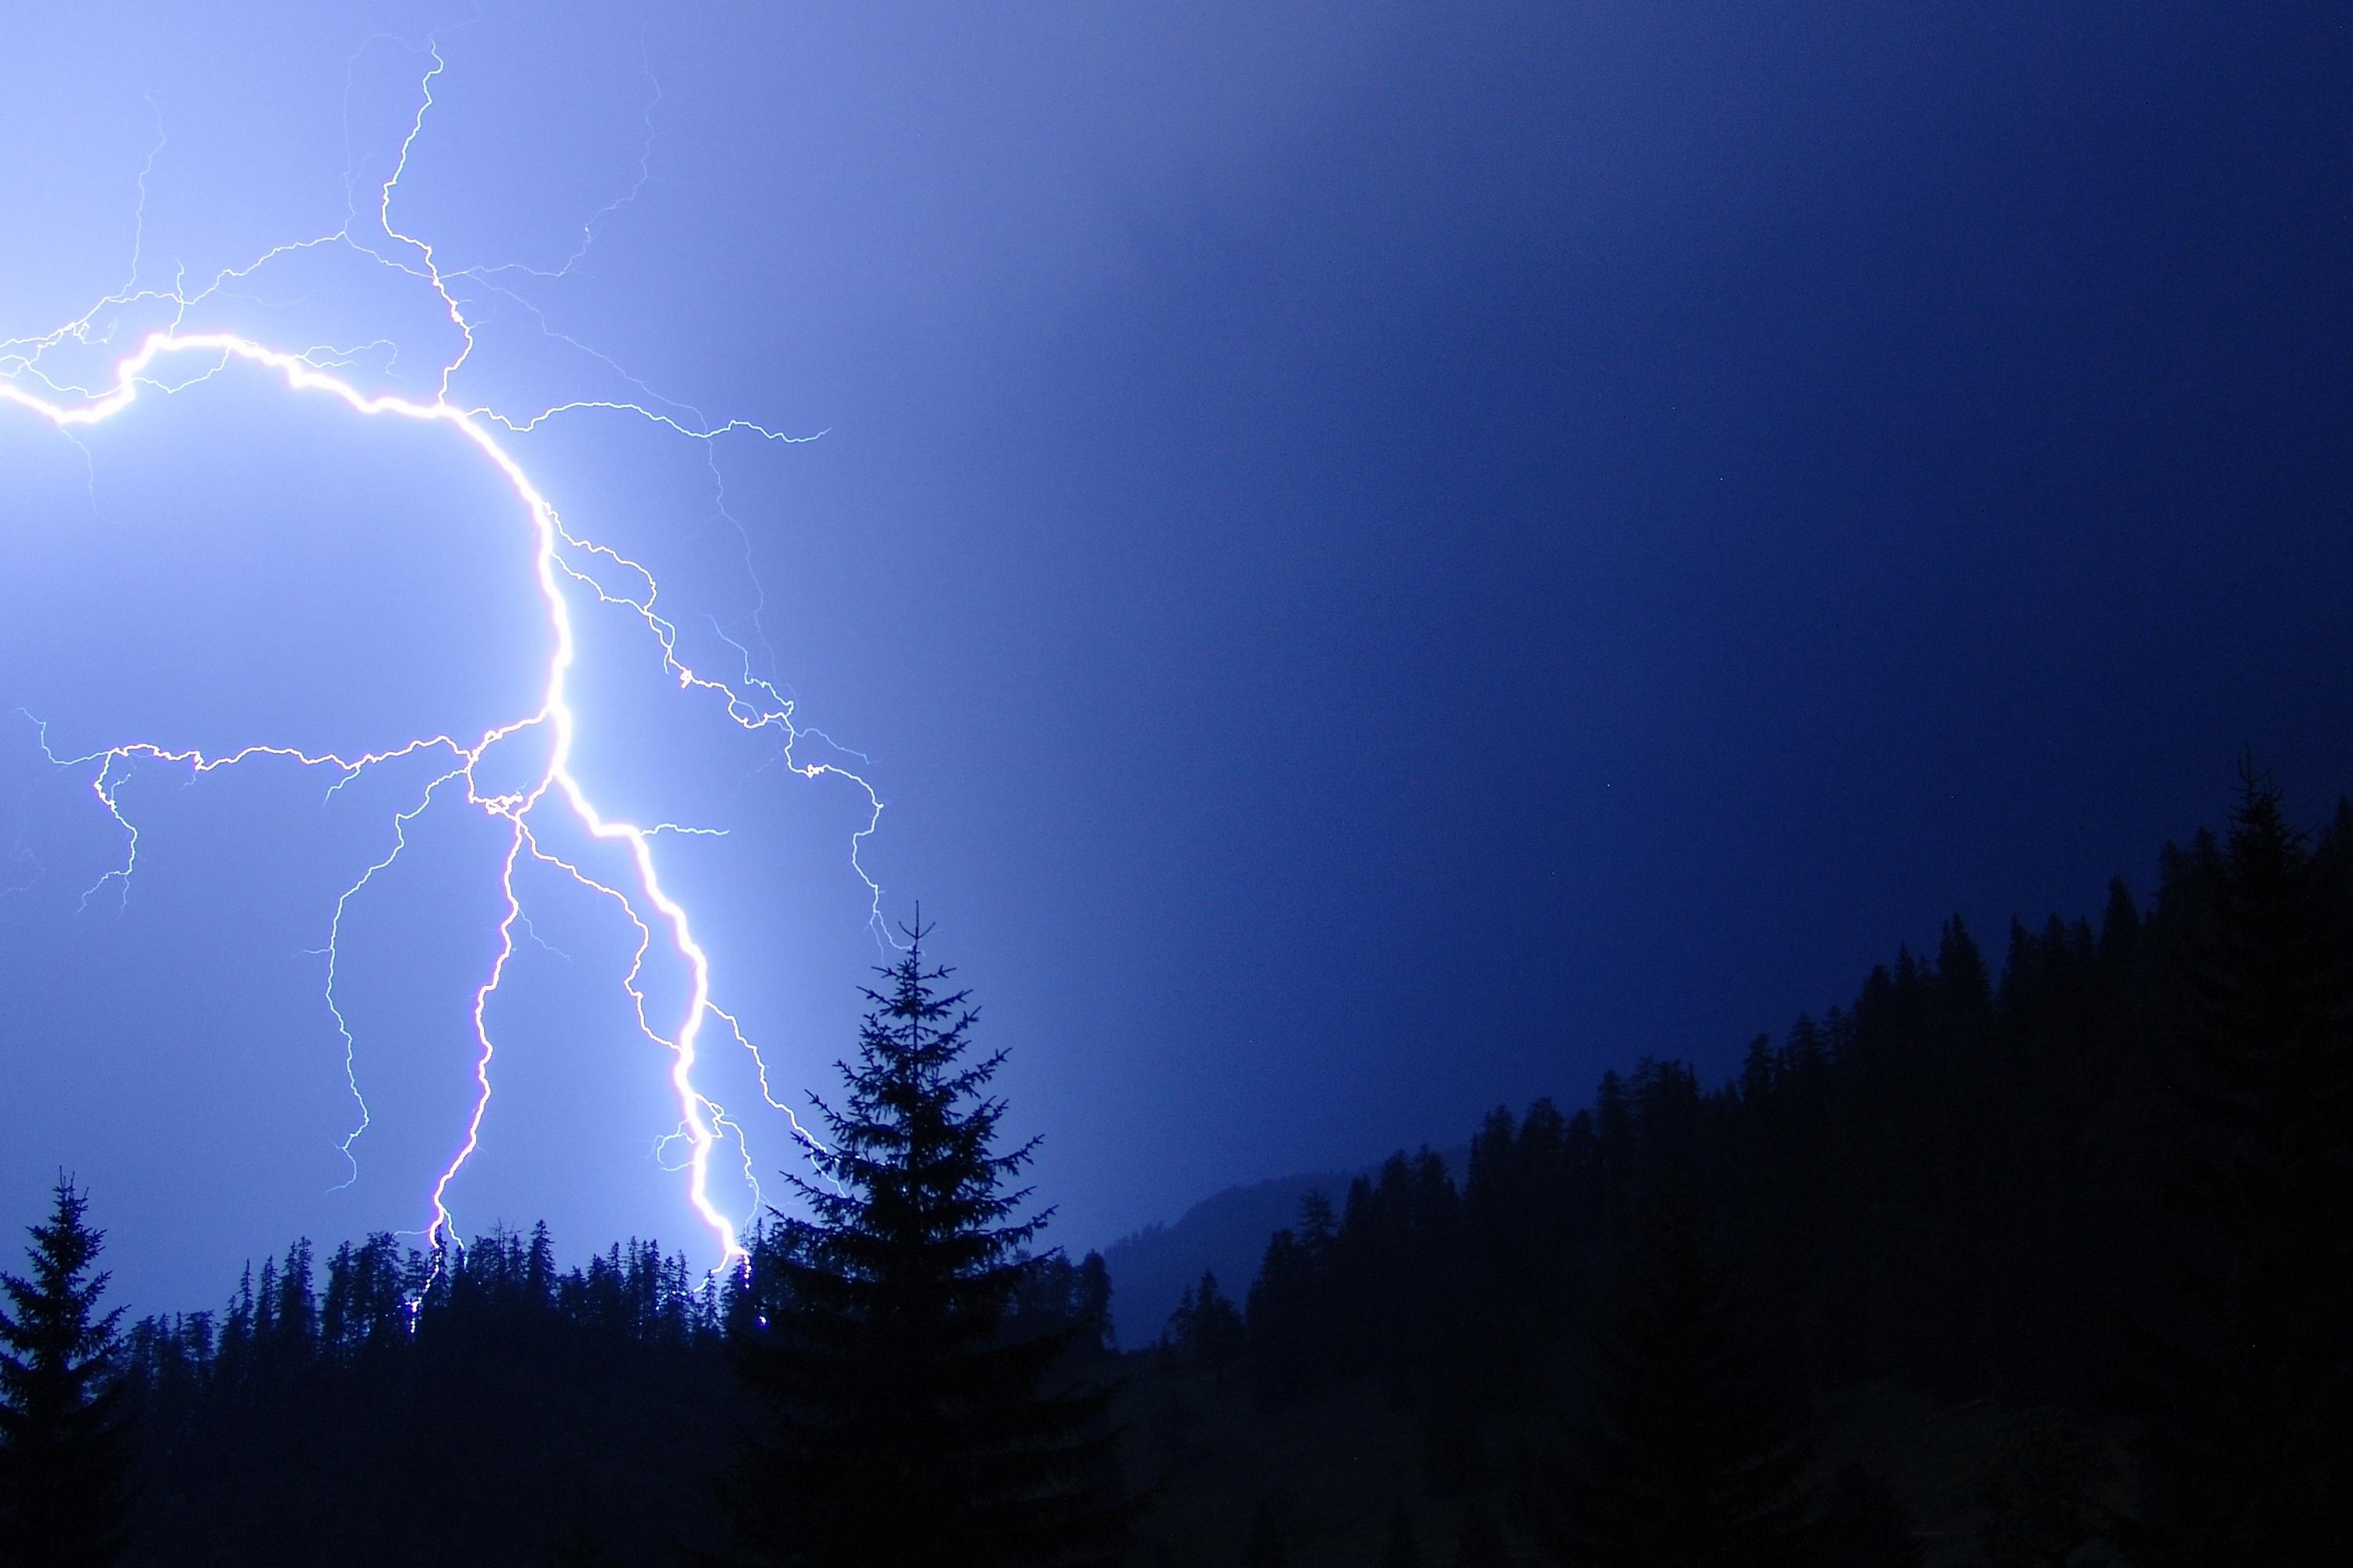 Datei:Blitz Gewitter in den Bergen.jpg – Wikipedia